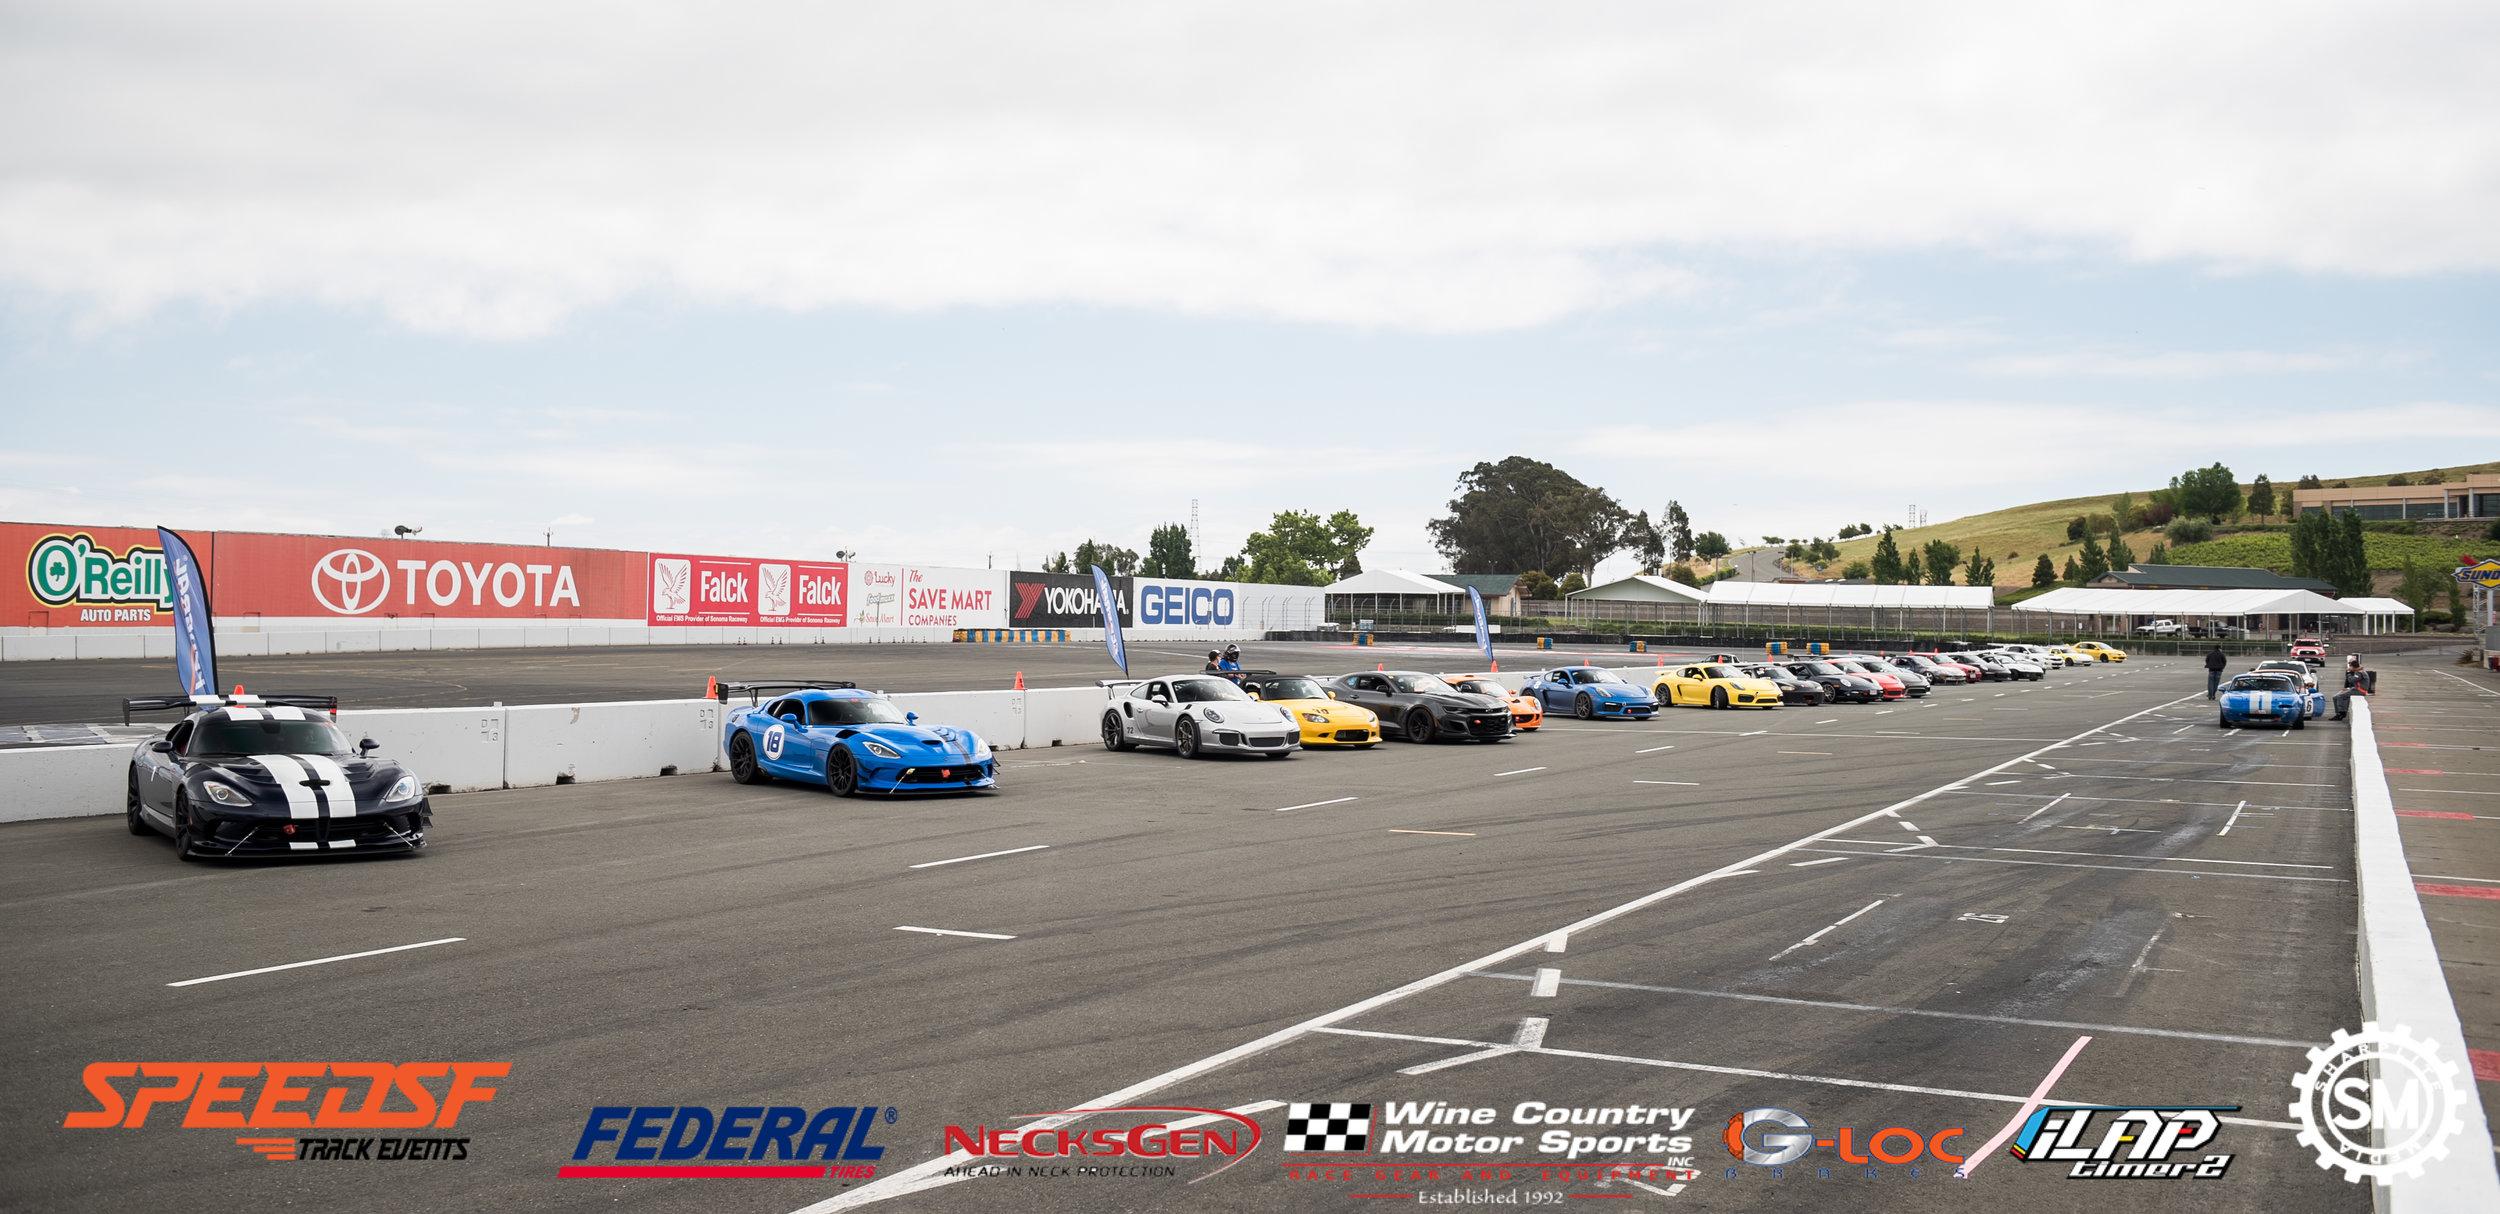 SpeedSF Saturday_-16.jpg